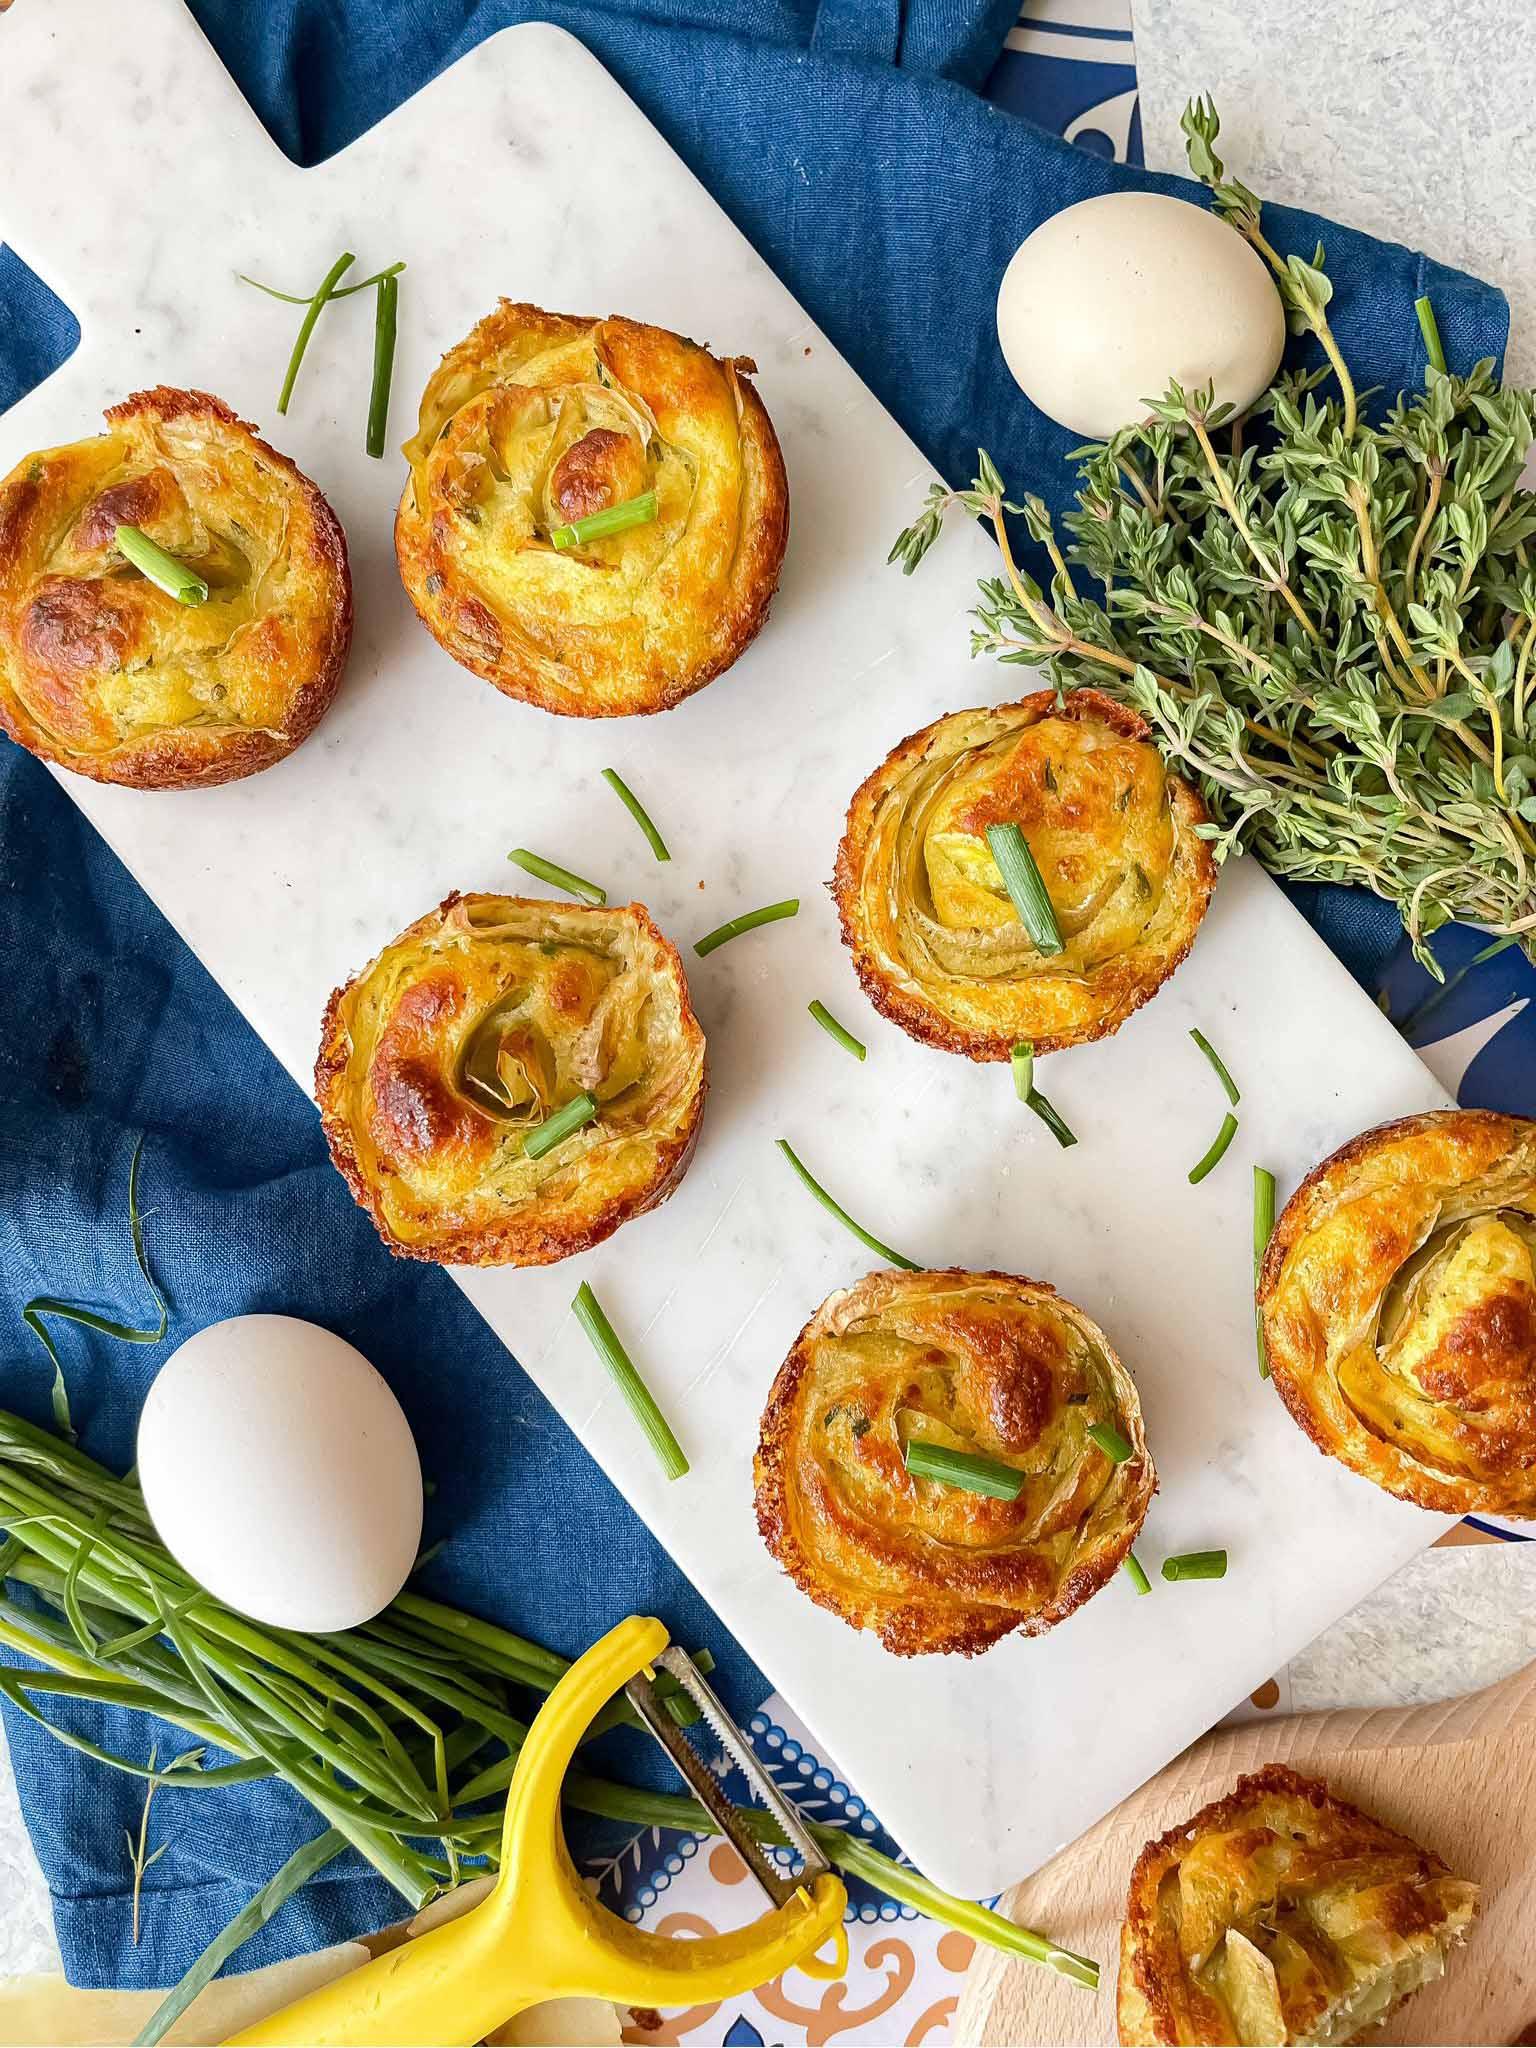 #IOCUCINOSENZASPRECHI Muffin salati con patate